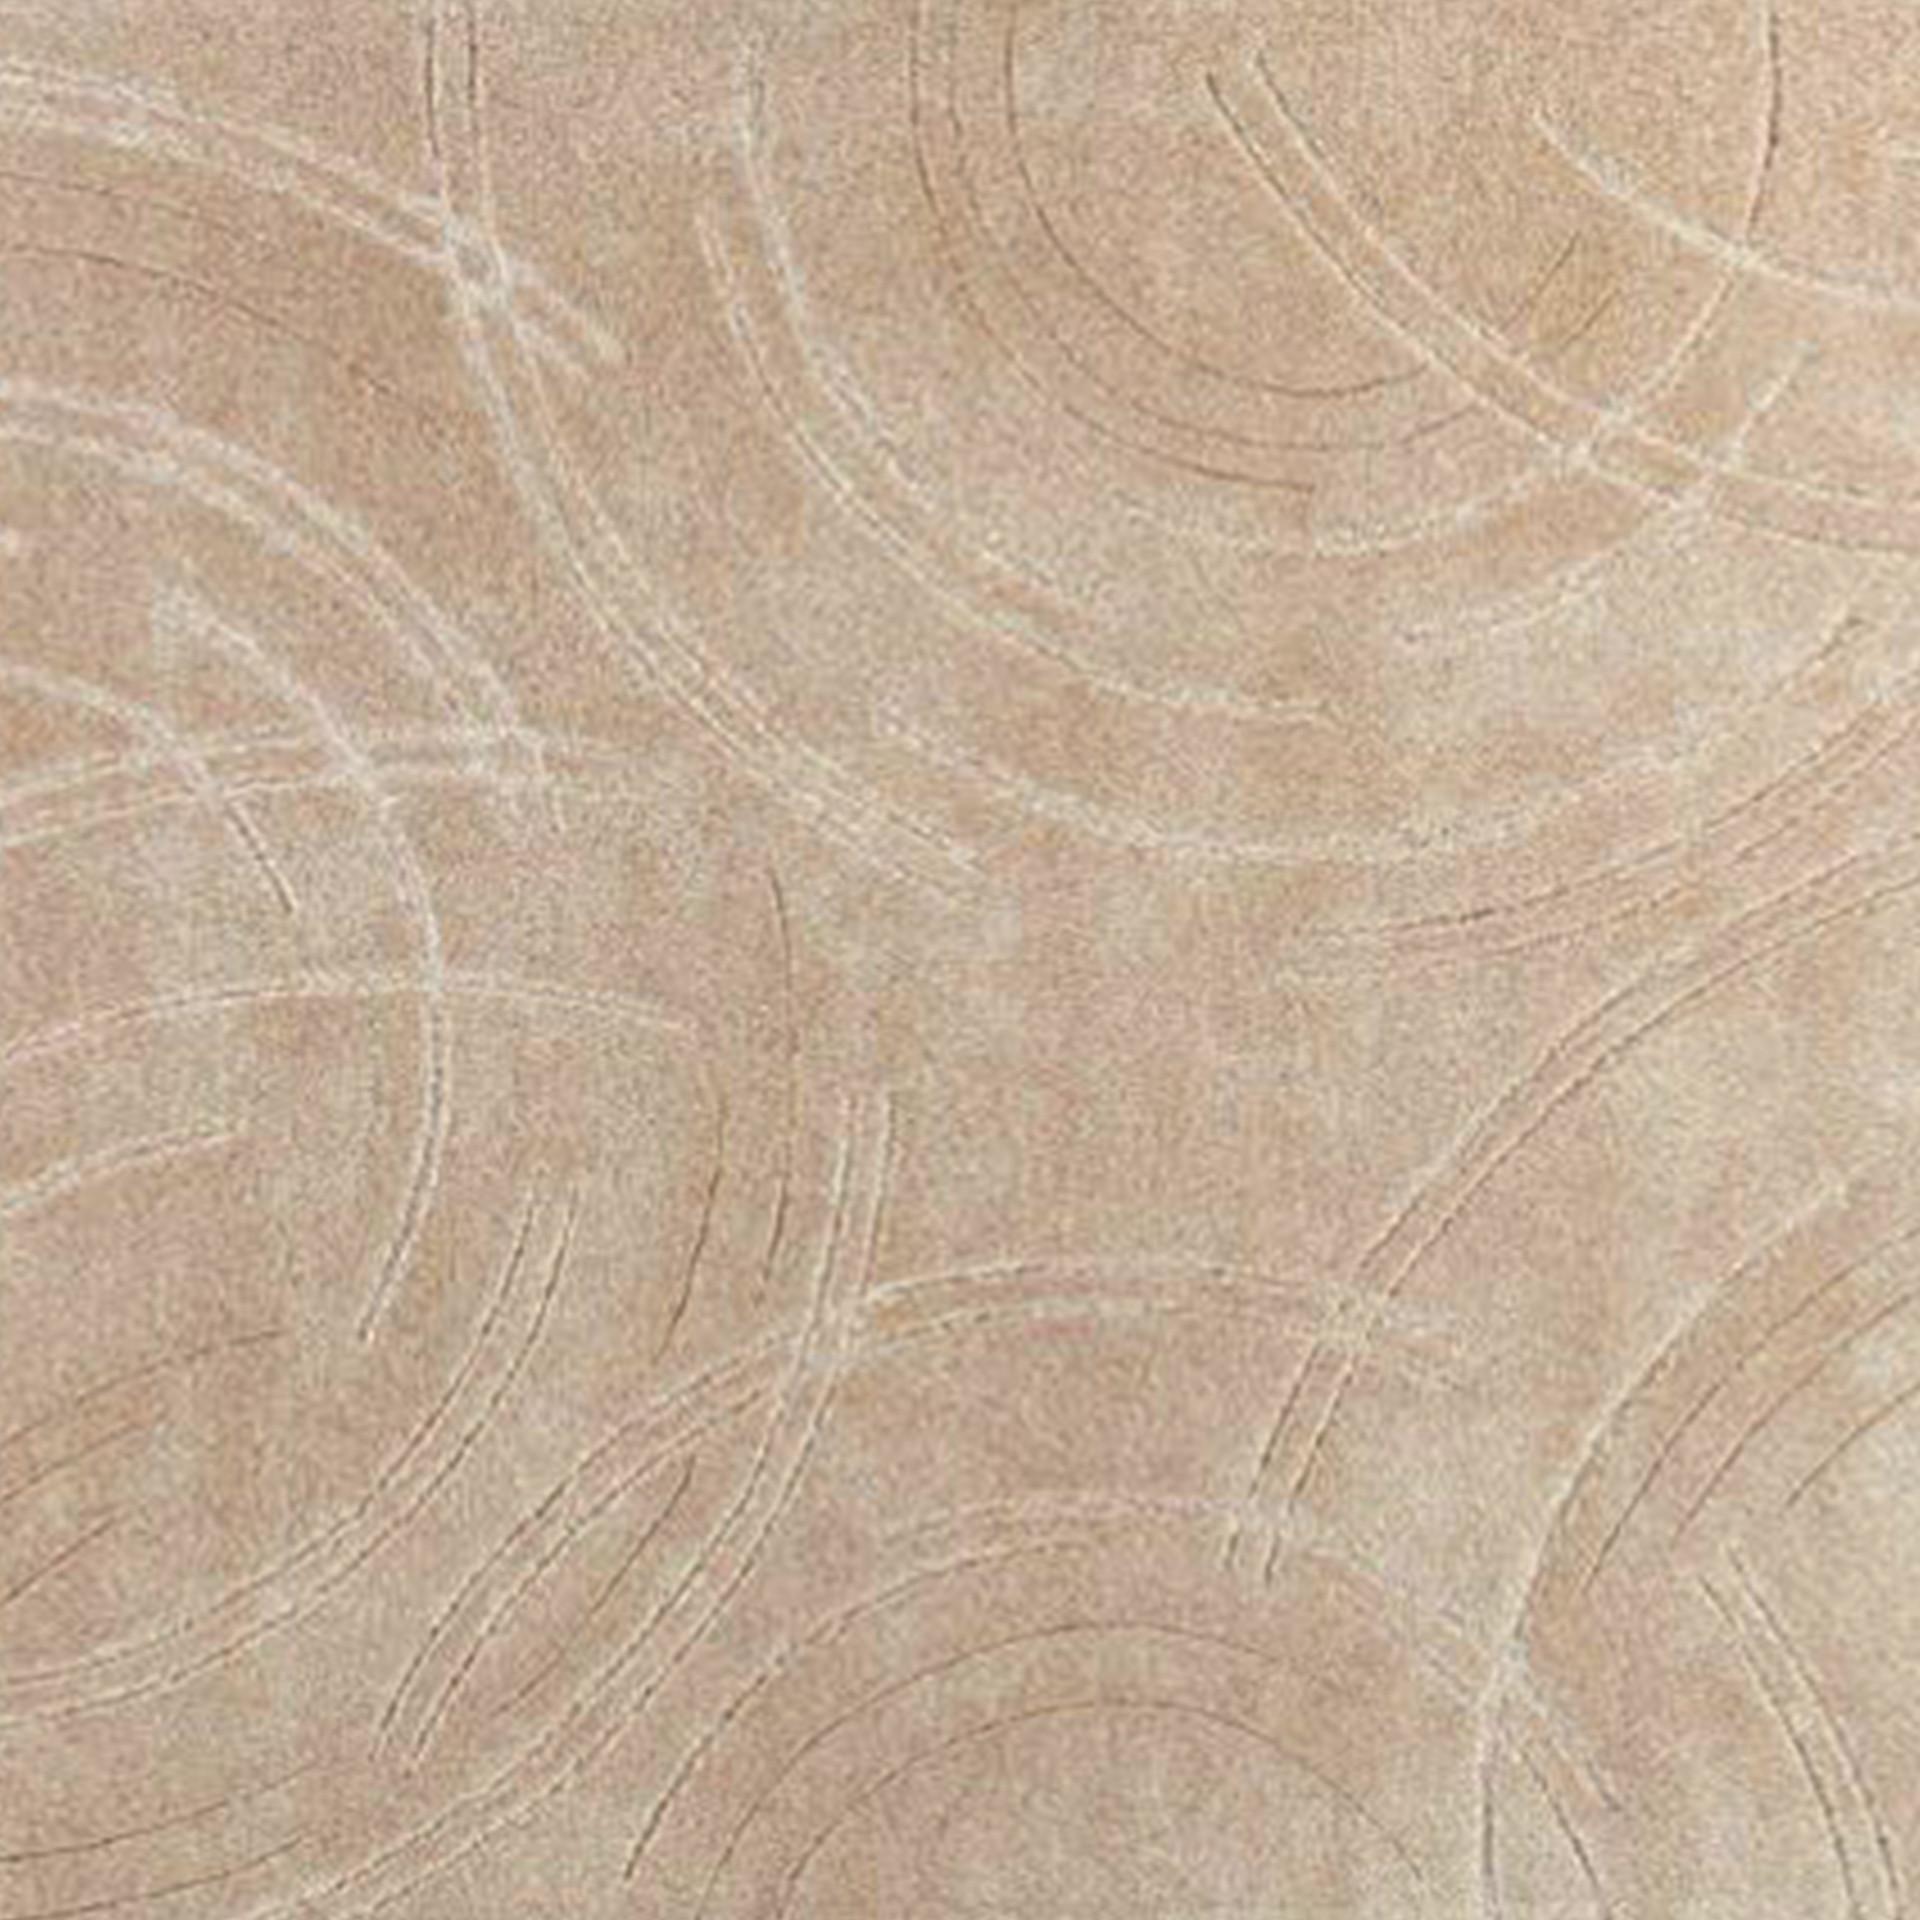 Carpet_4.jpg